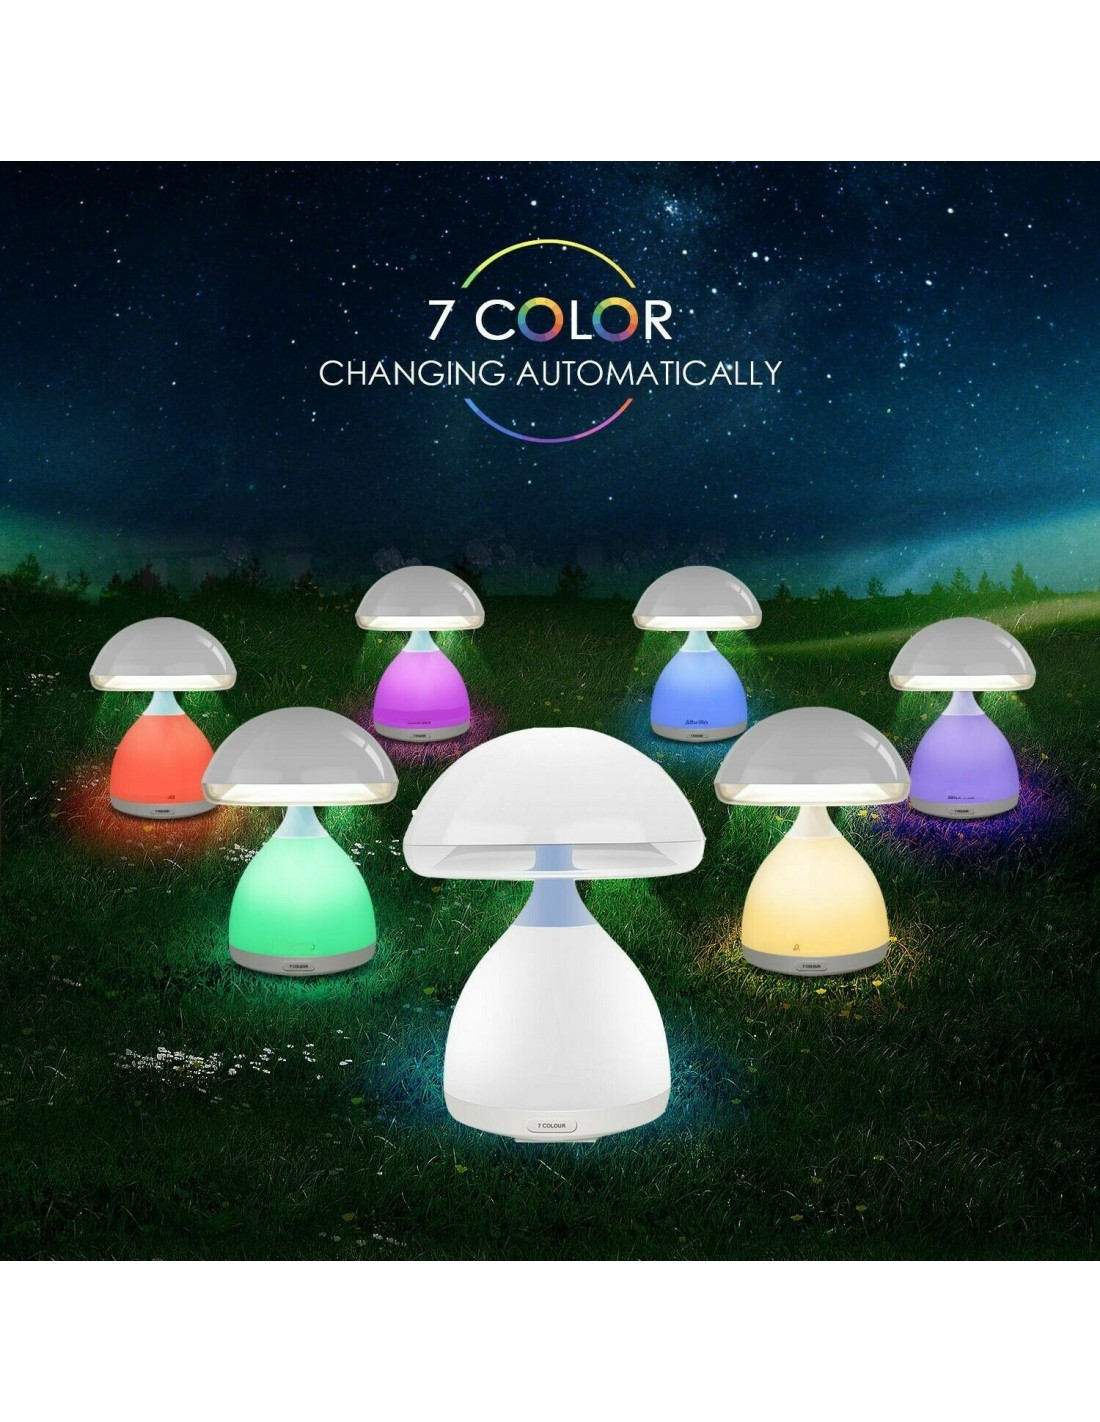 Lampada Moderna Da Tavolo Comodino A Led A Forma Fungo Cromoterapia A 7 Colori